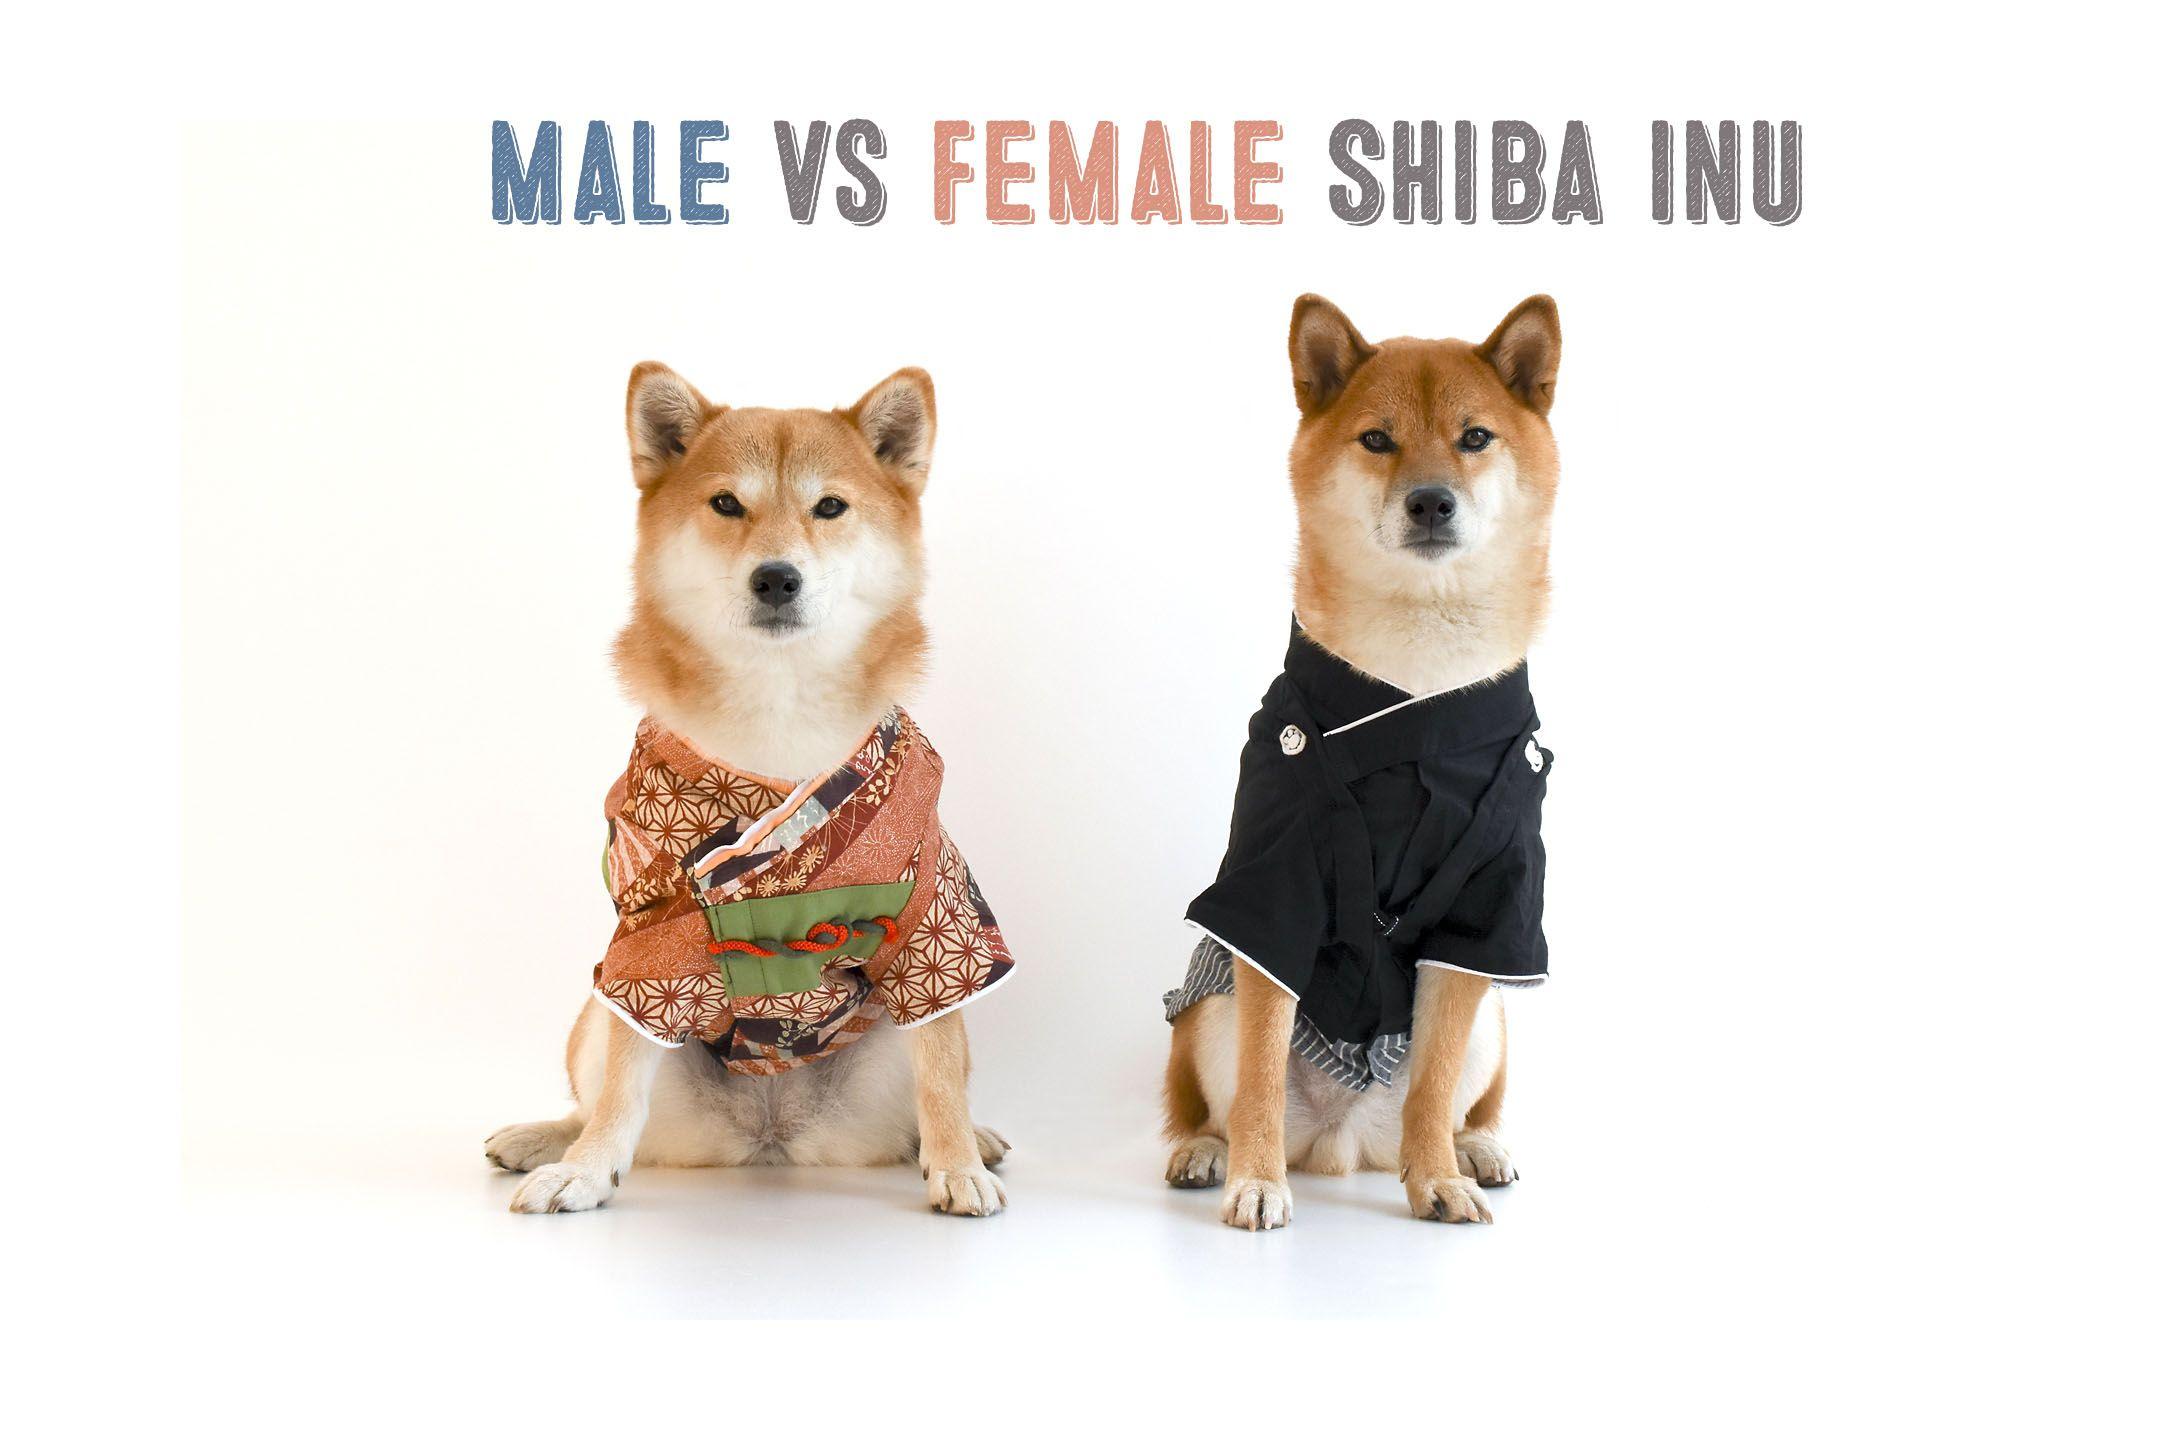 Male Vs Female Shiba Inus My First Shiba Inu Shiba Inu Shiba Inu Dog Shiba Inu Puppy